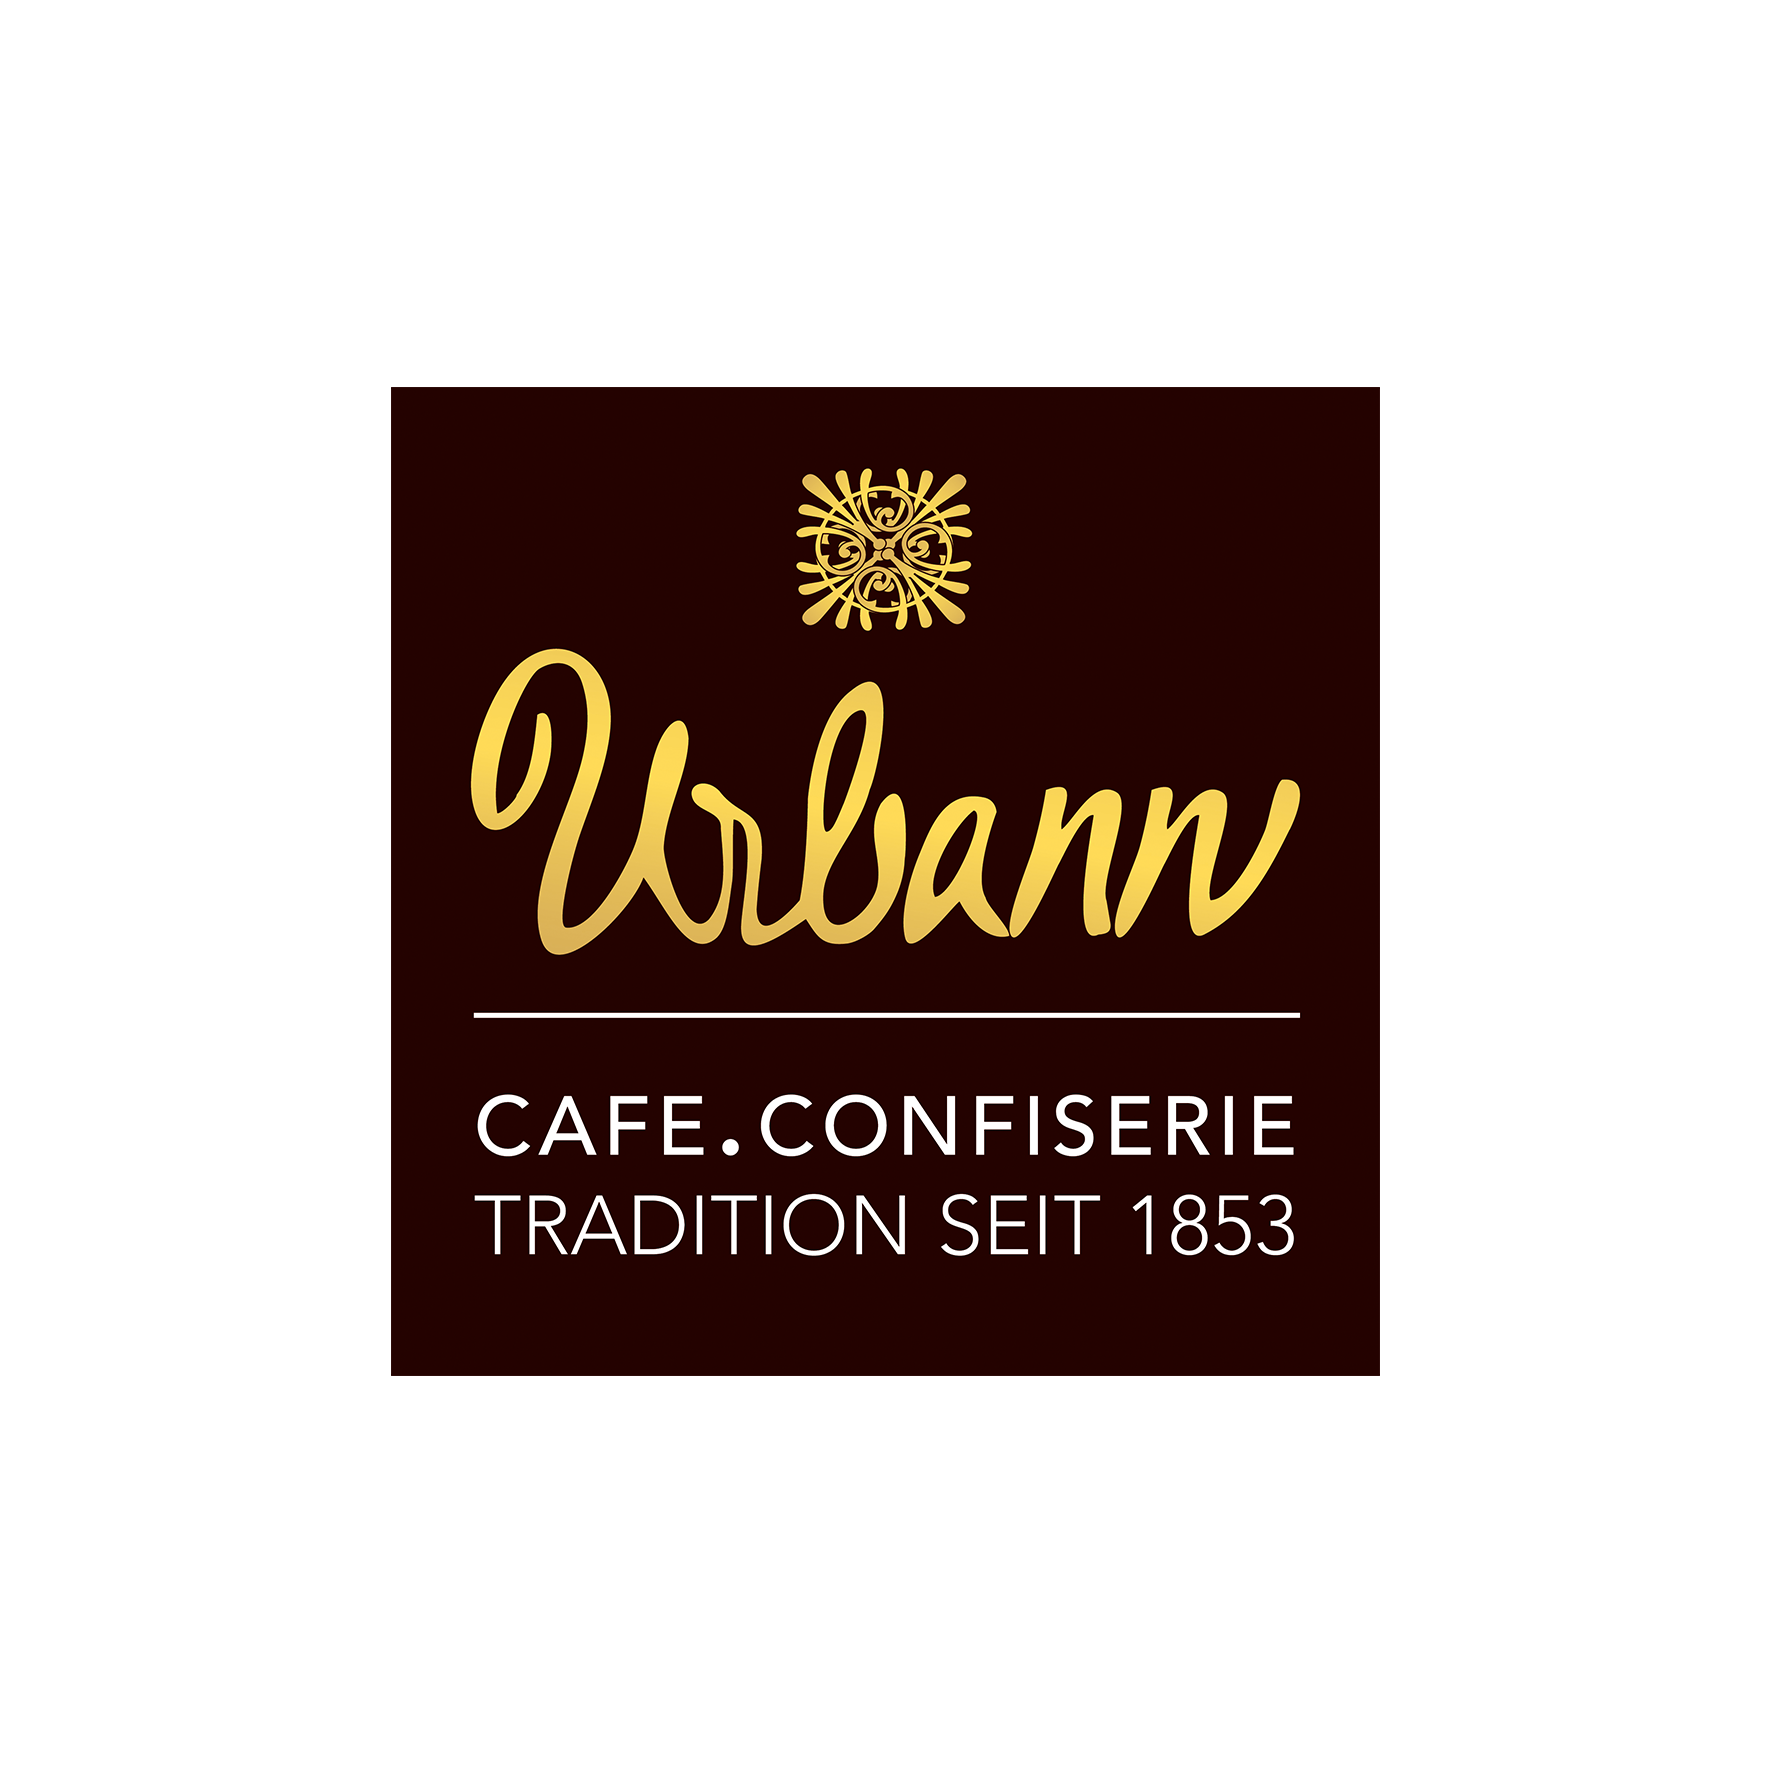 URBANN CAFE